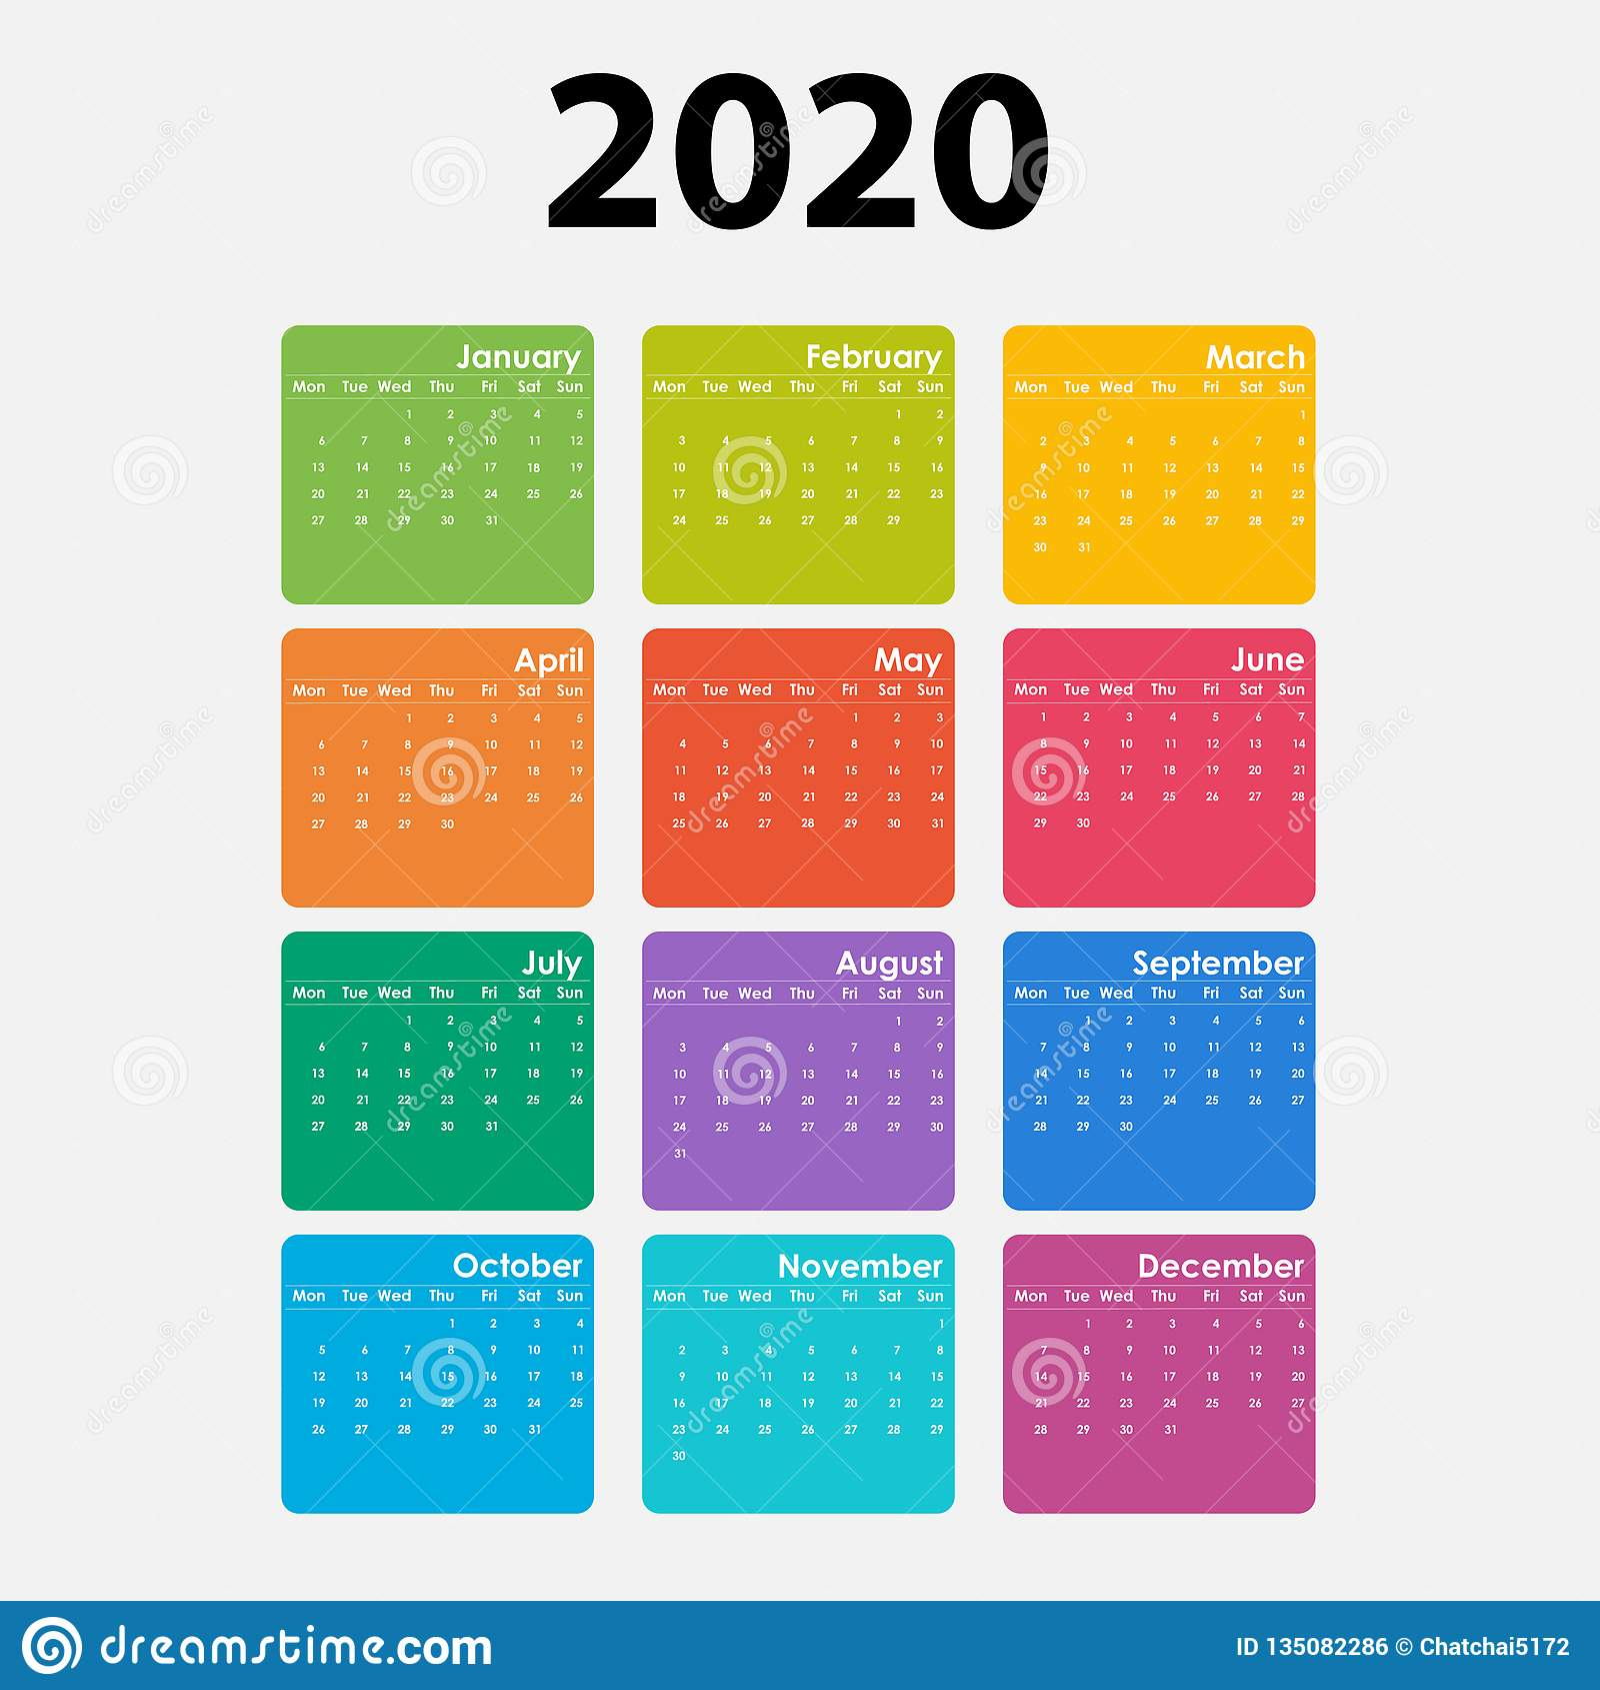 Poster Calendario 2020.2020 Calendar Template Calendar 2020 Set Of 12 Months Yearly